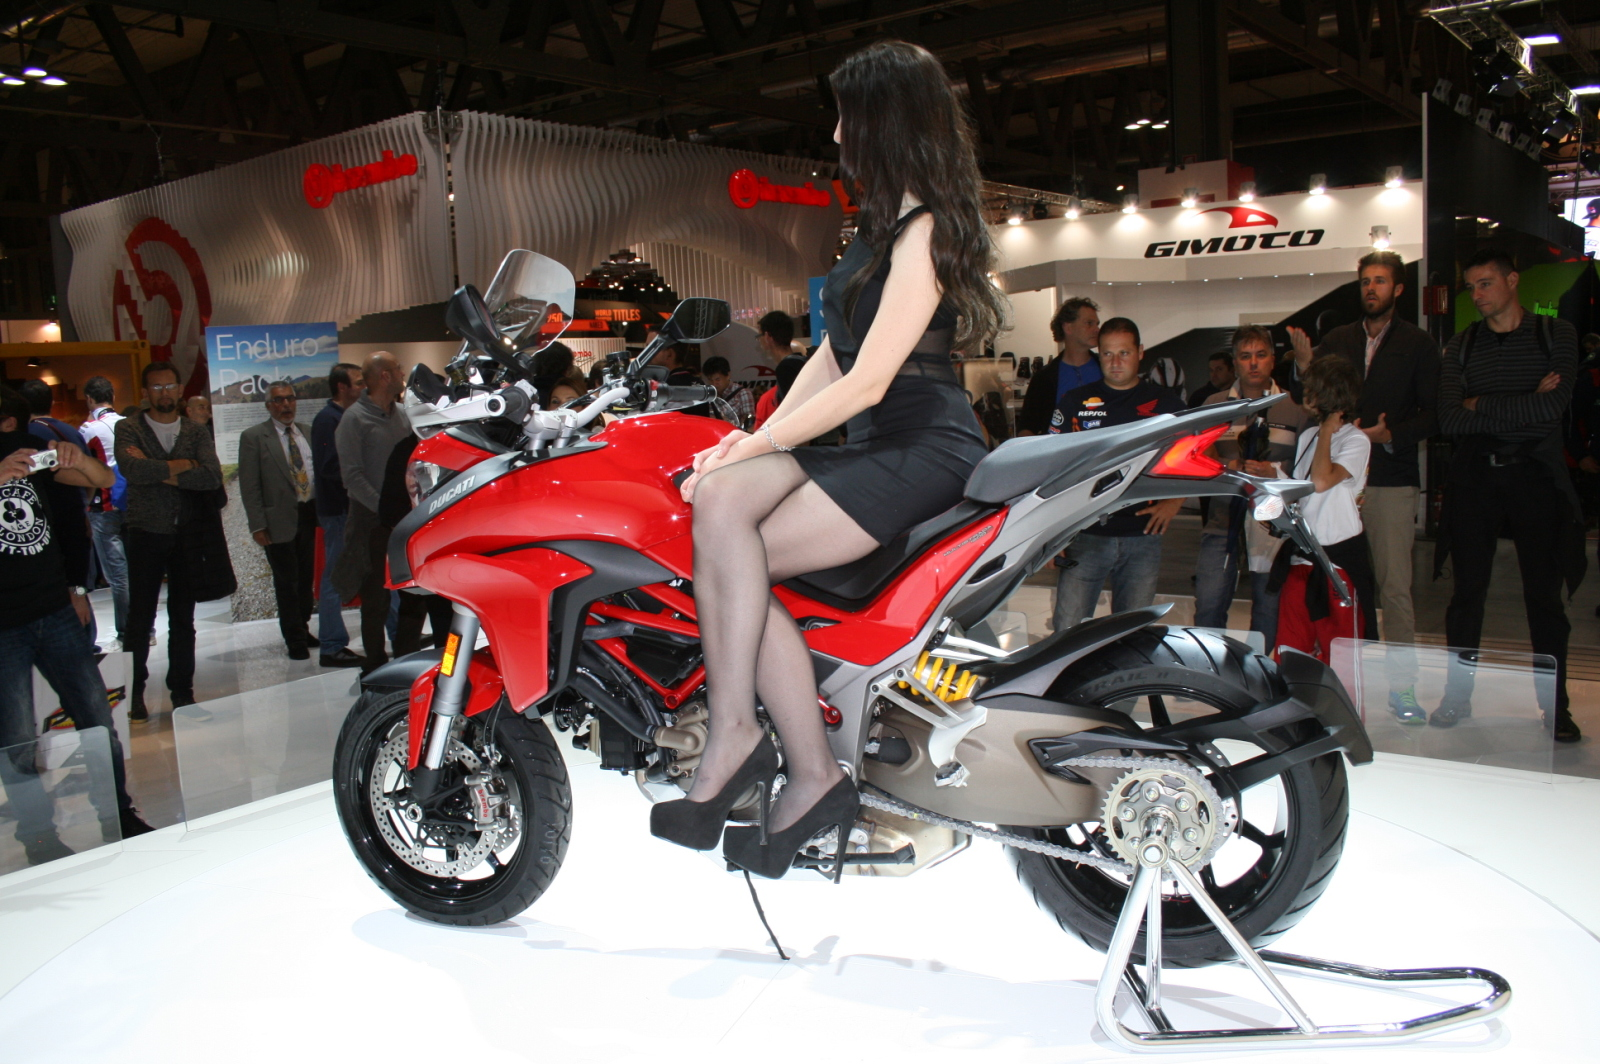 Ducati MTS 1200 S